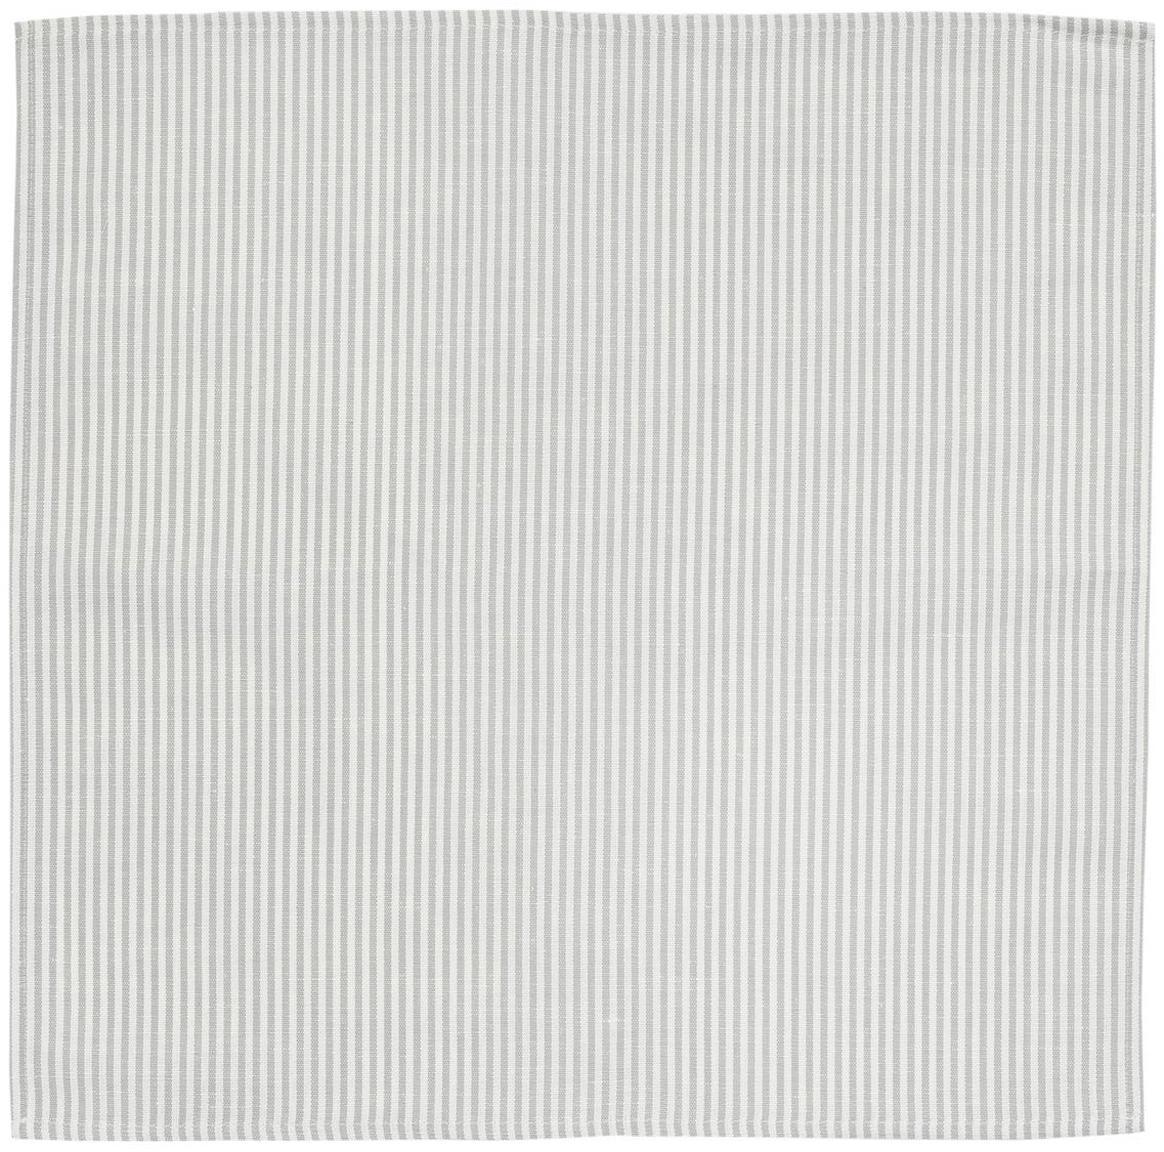 Servilletas de lino Streifen, 6uds., Blanco, gris, An 45 x L 45 cm